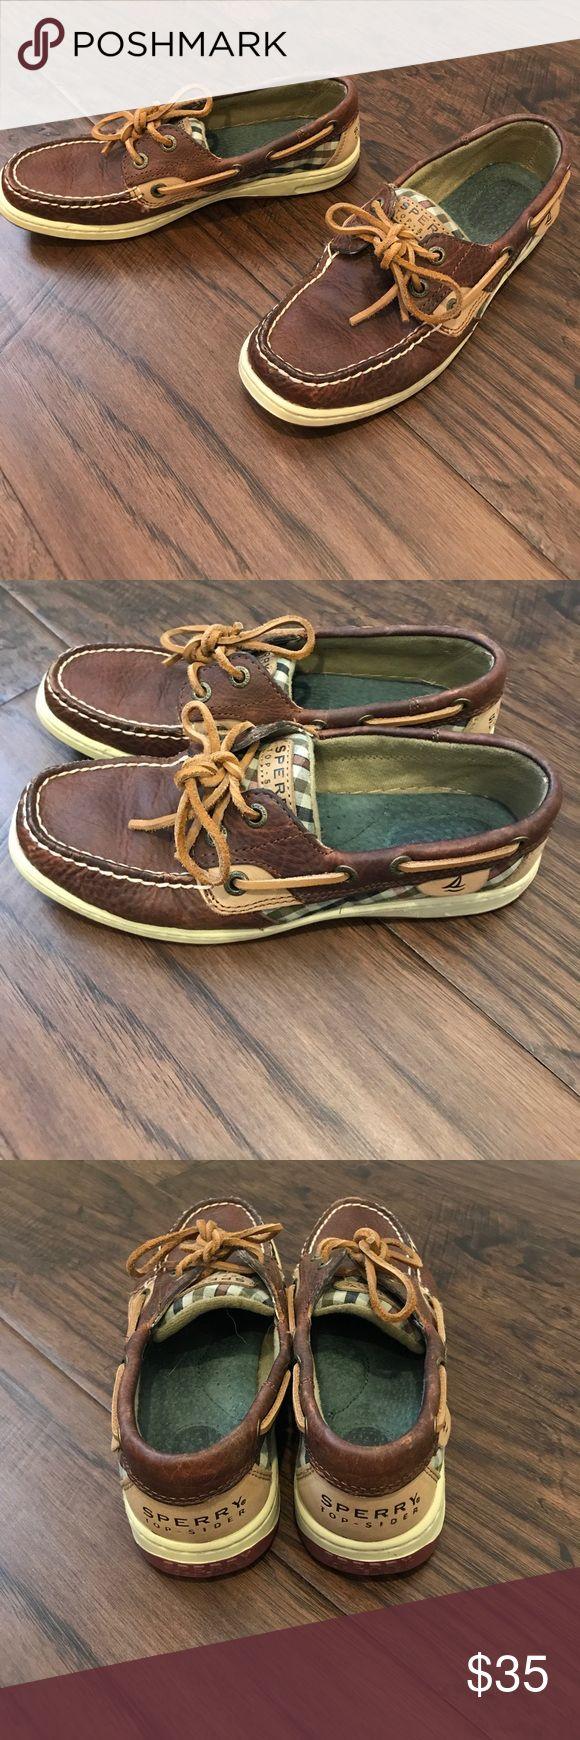 Dark brown /plaid sperry boat shoes USED Brown Sperry Boat Shoes. No box Sperry Shoes Flats & Loafers